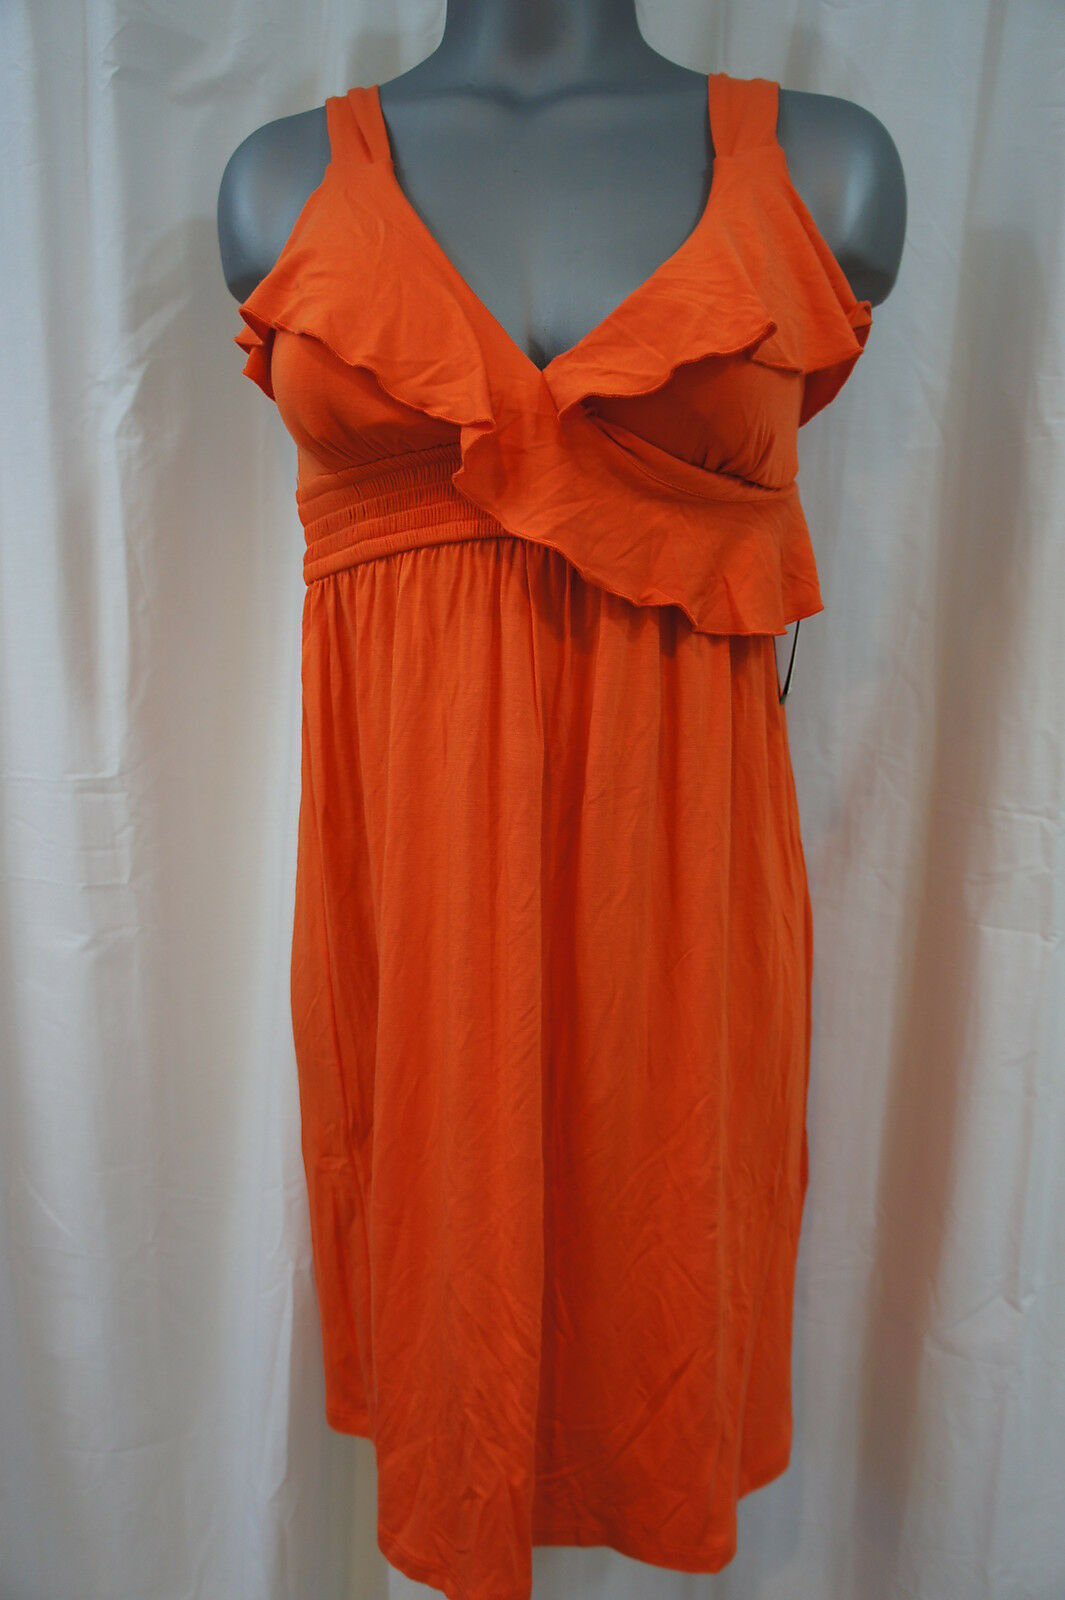 Nataci n cubierta kenneth cole reacci n talla s mandarina naranja ropa de verano swimwear - Mandarina home online ...